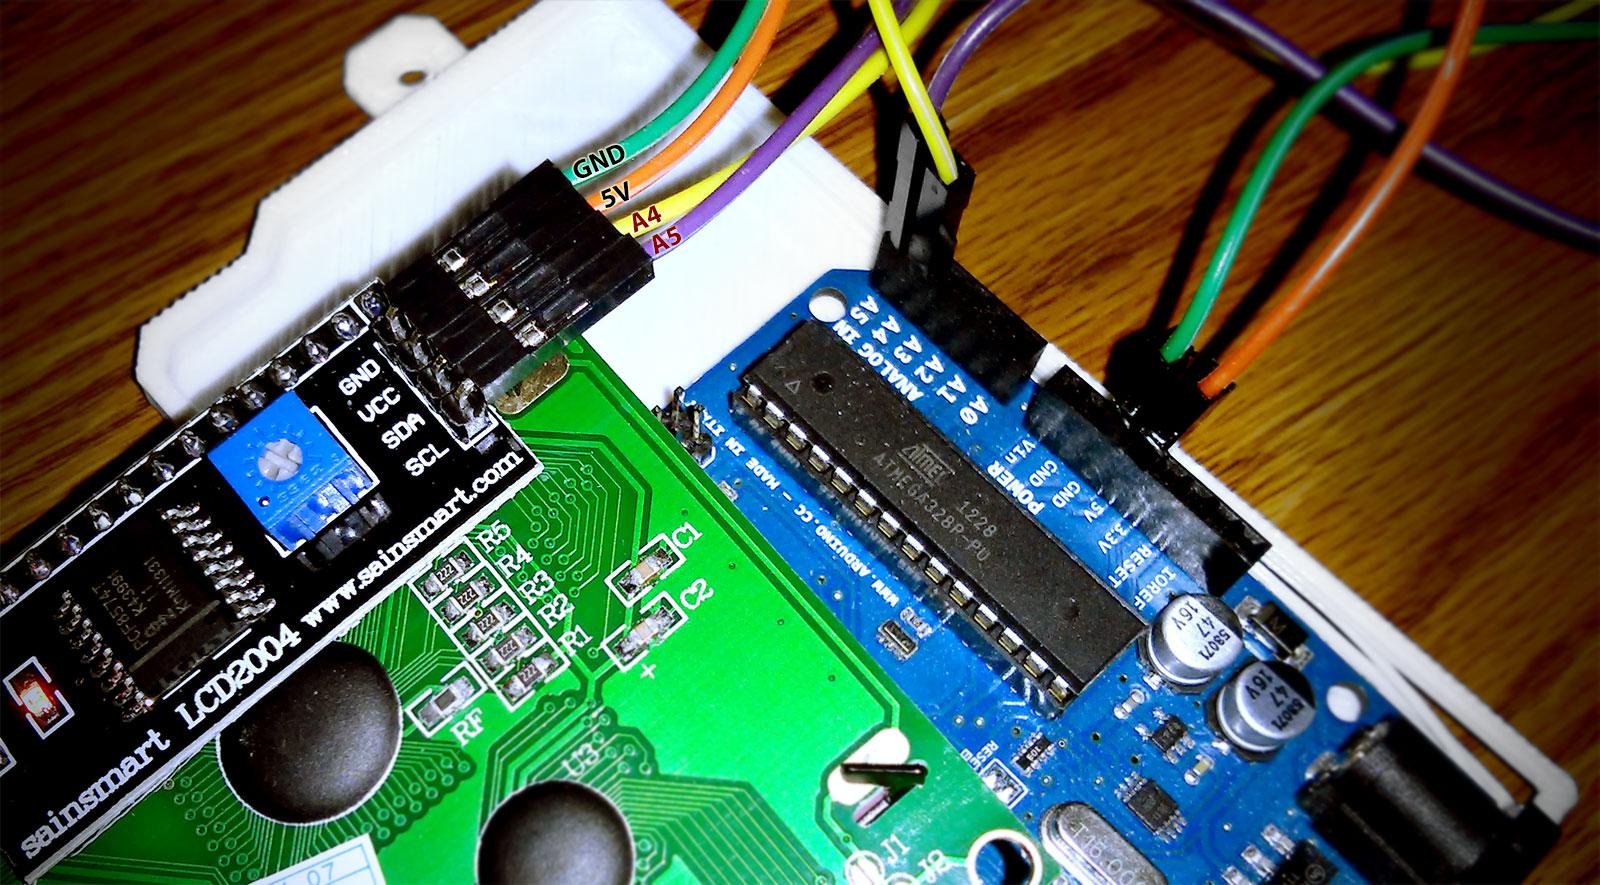 pin 7 arduino detailed diagram of the ear 43 sainsmart lcd2004 serial 164 lcd screen  steve